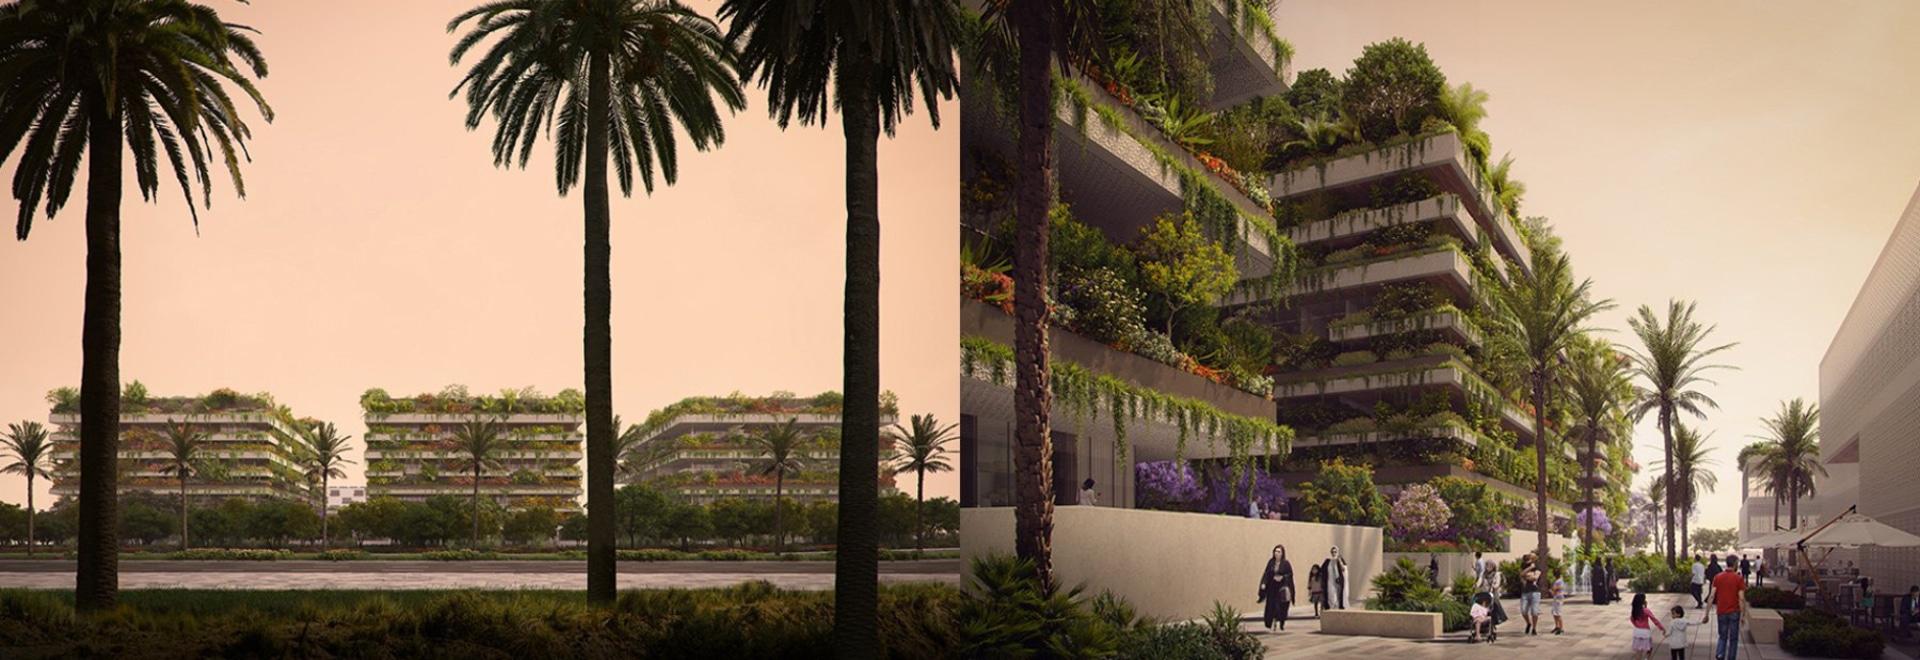 stefano boeri planea tres'cubos verdes' para egipto que formarán el primer bosque vertical de áfrica